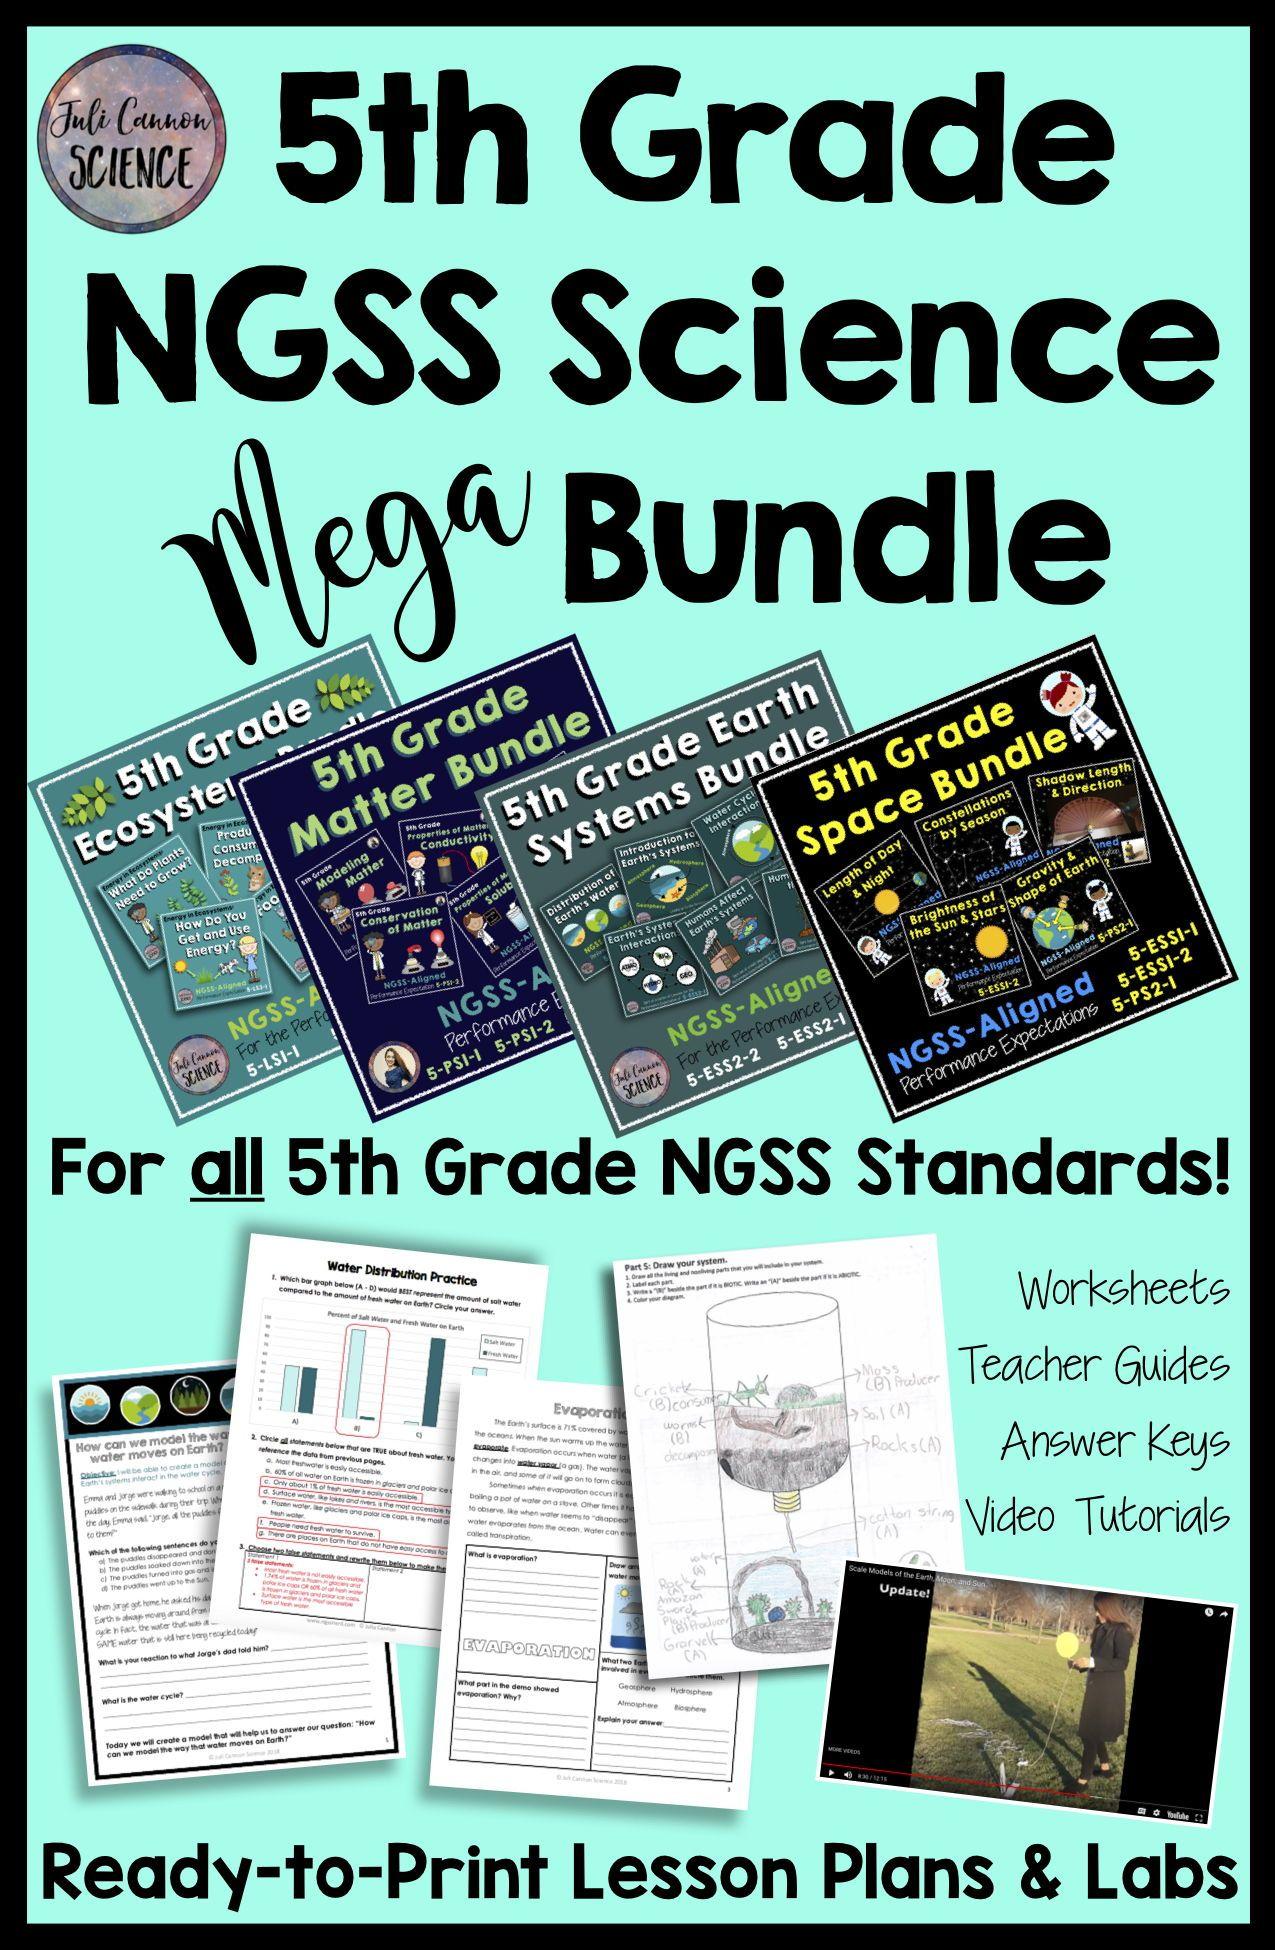 Complete 5th Grade Ngss Science Mega Bundle